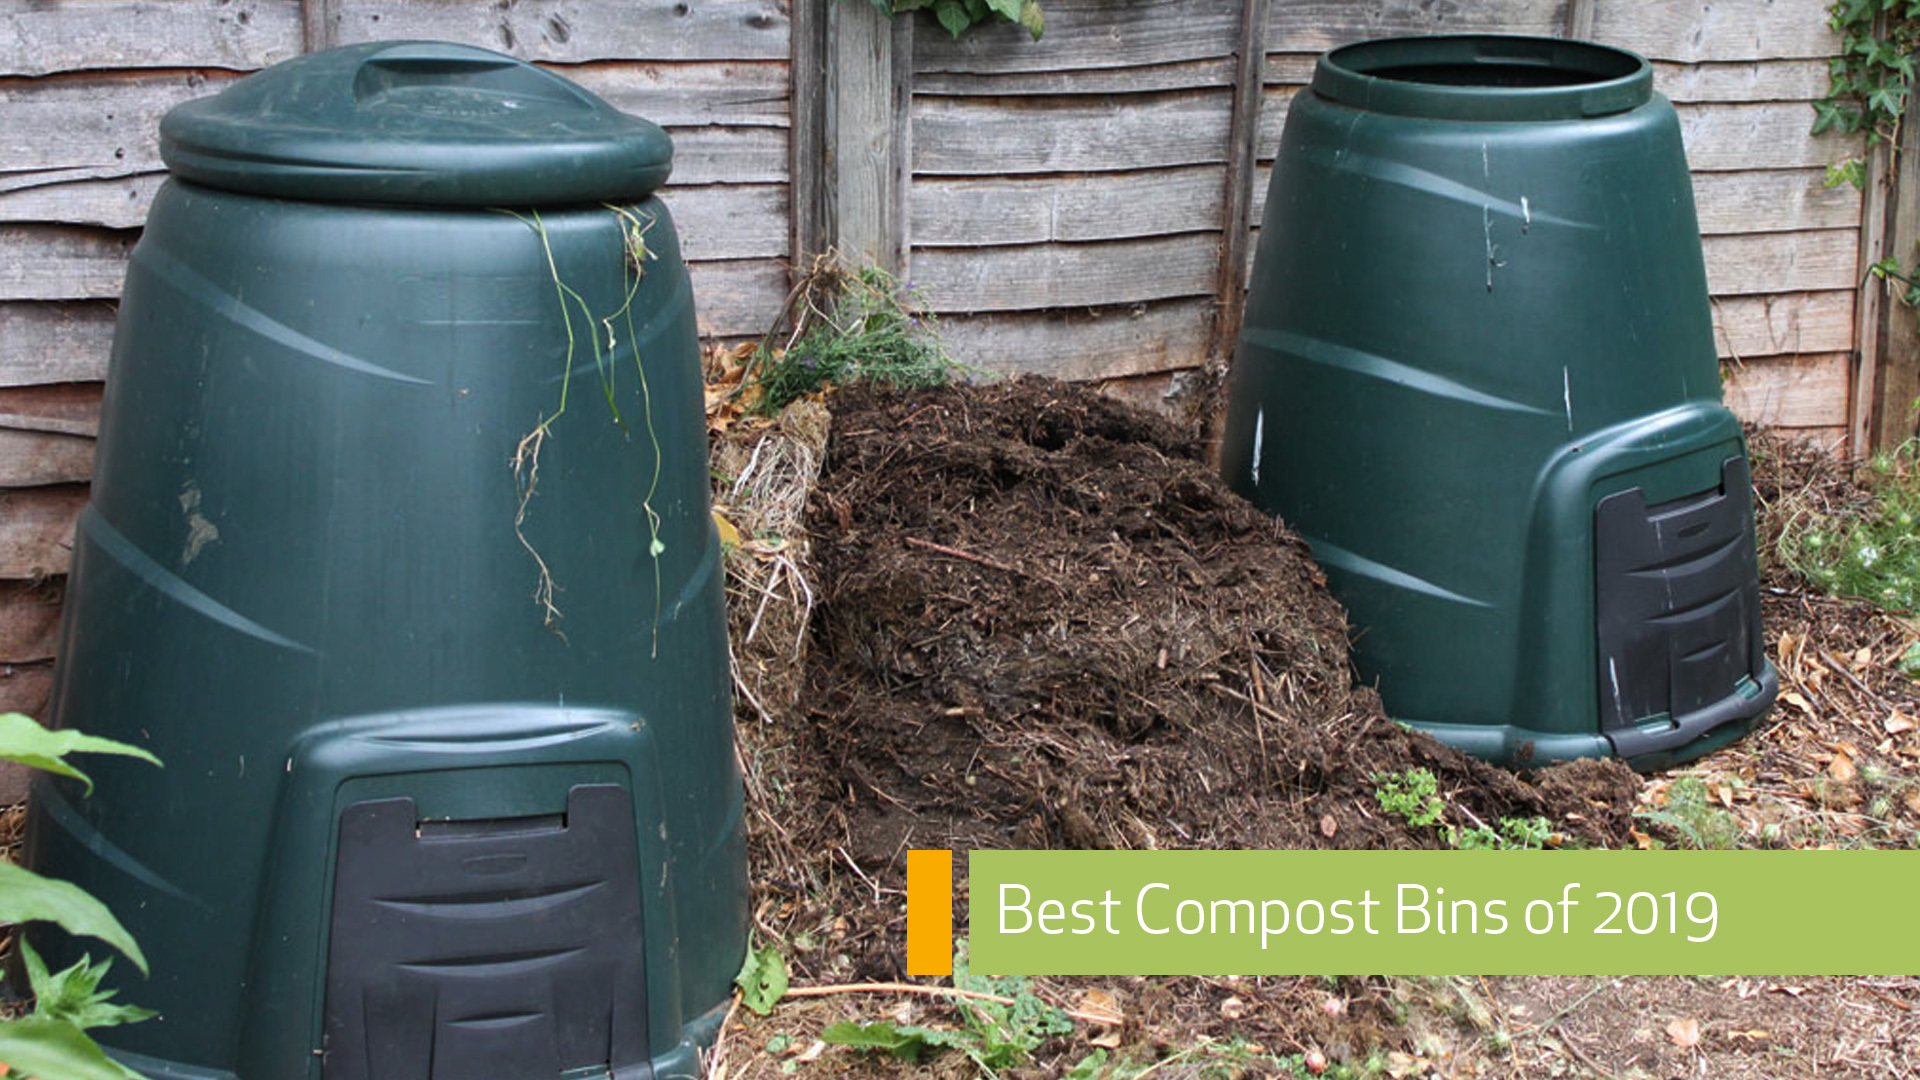 Best Compost Bins of 2019